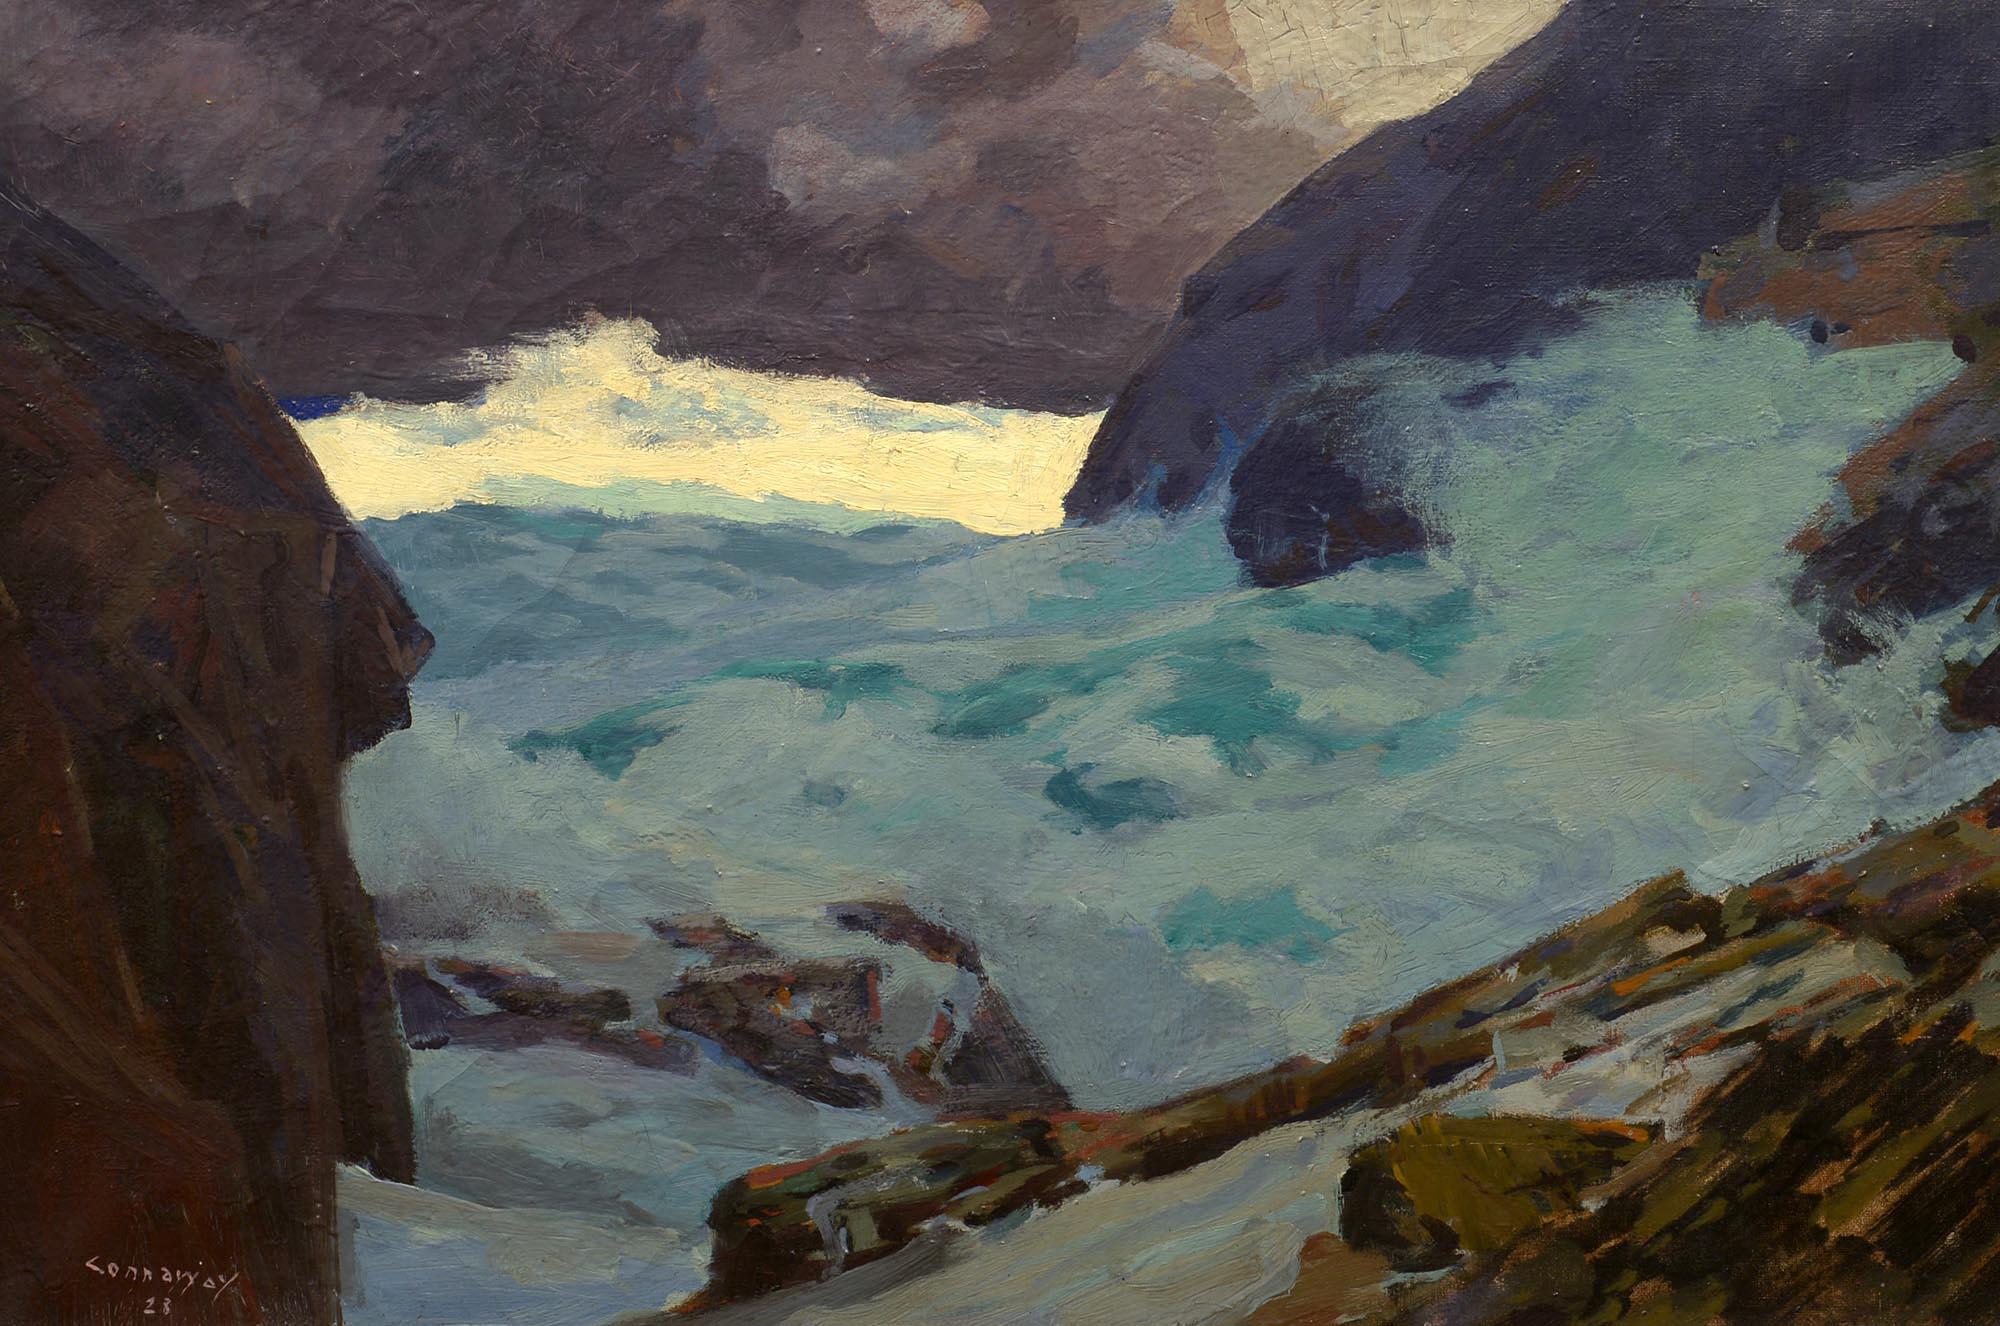 Jay Hall Connaway Beneath the Headlands, 1928